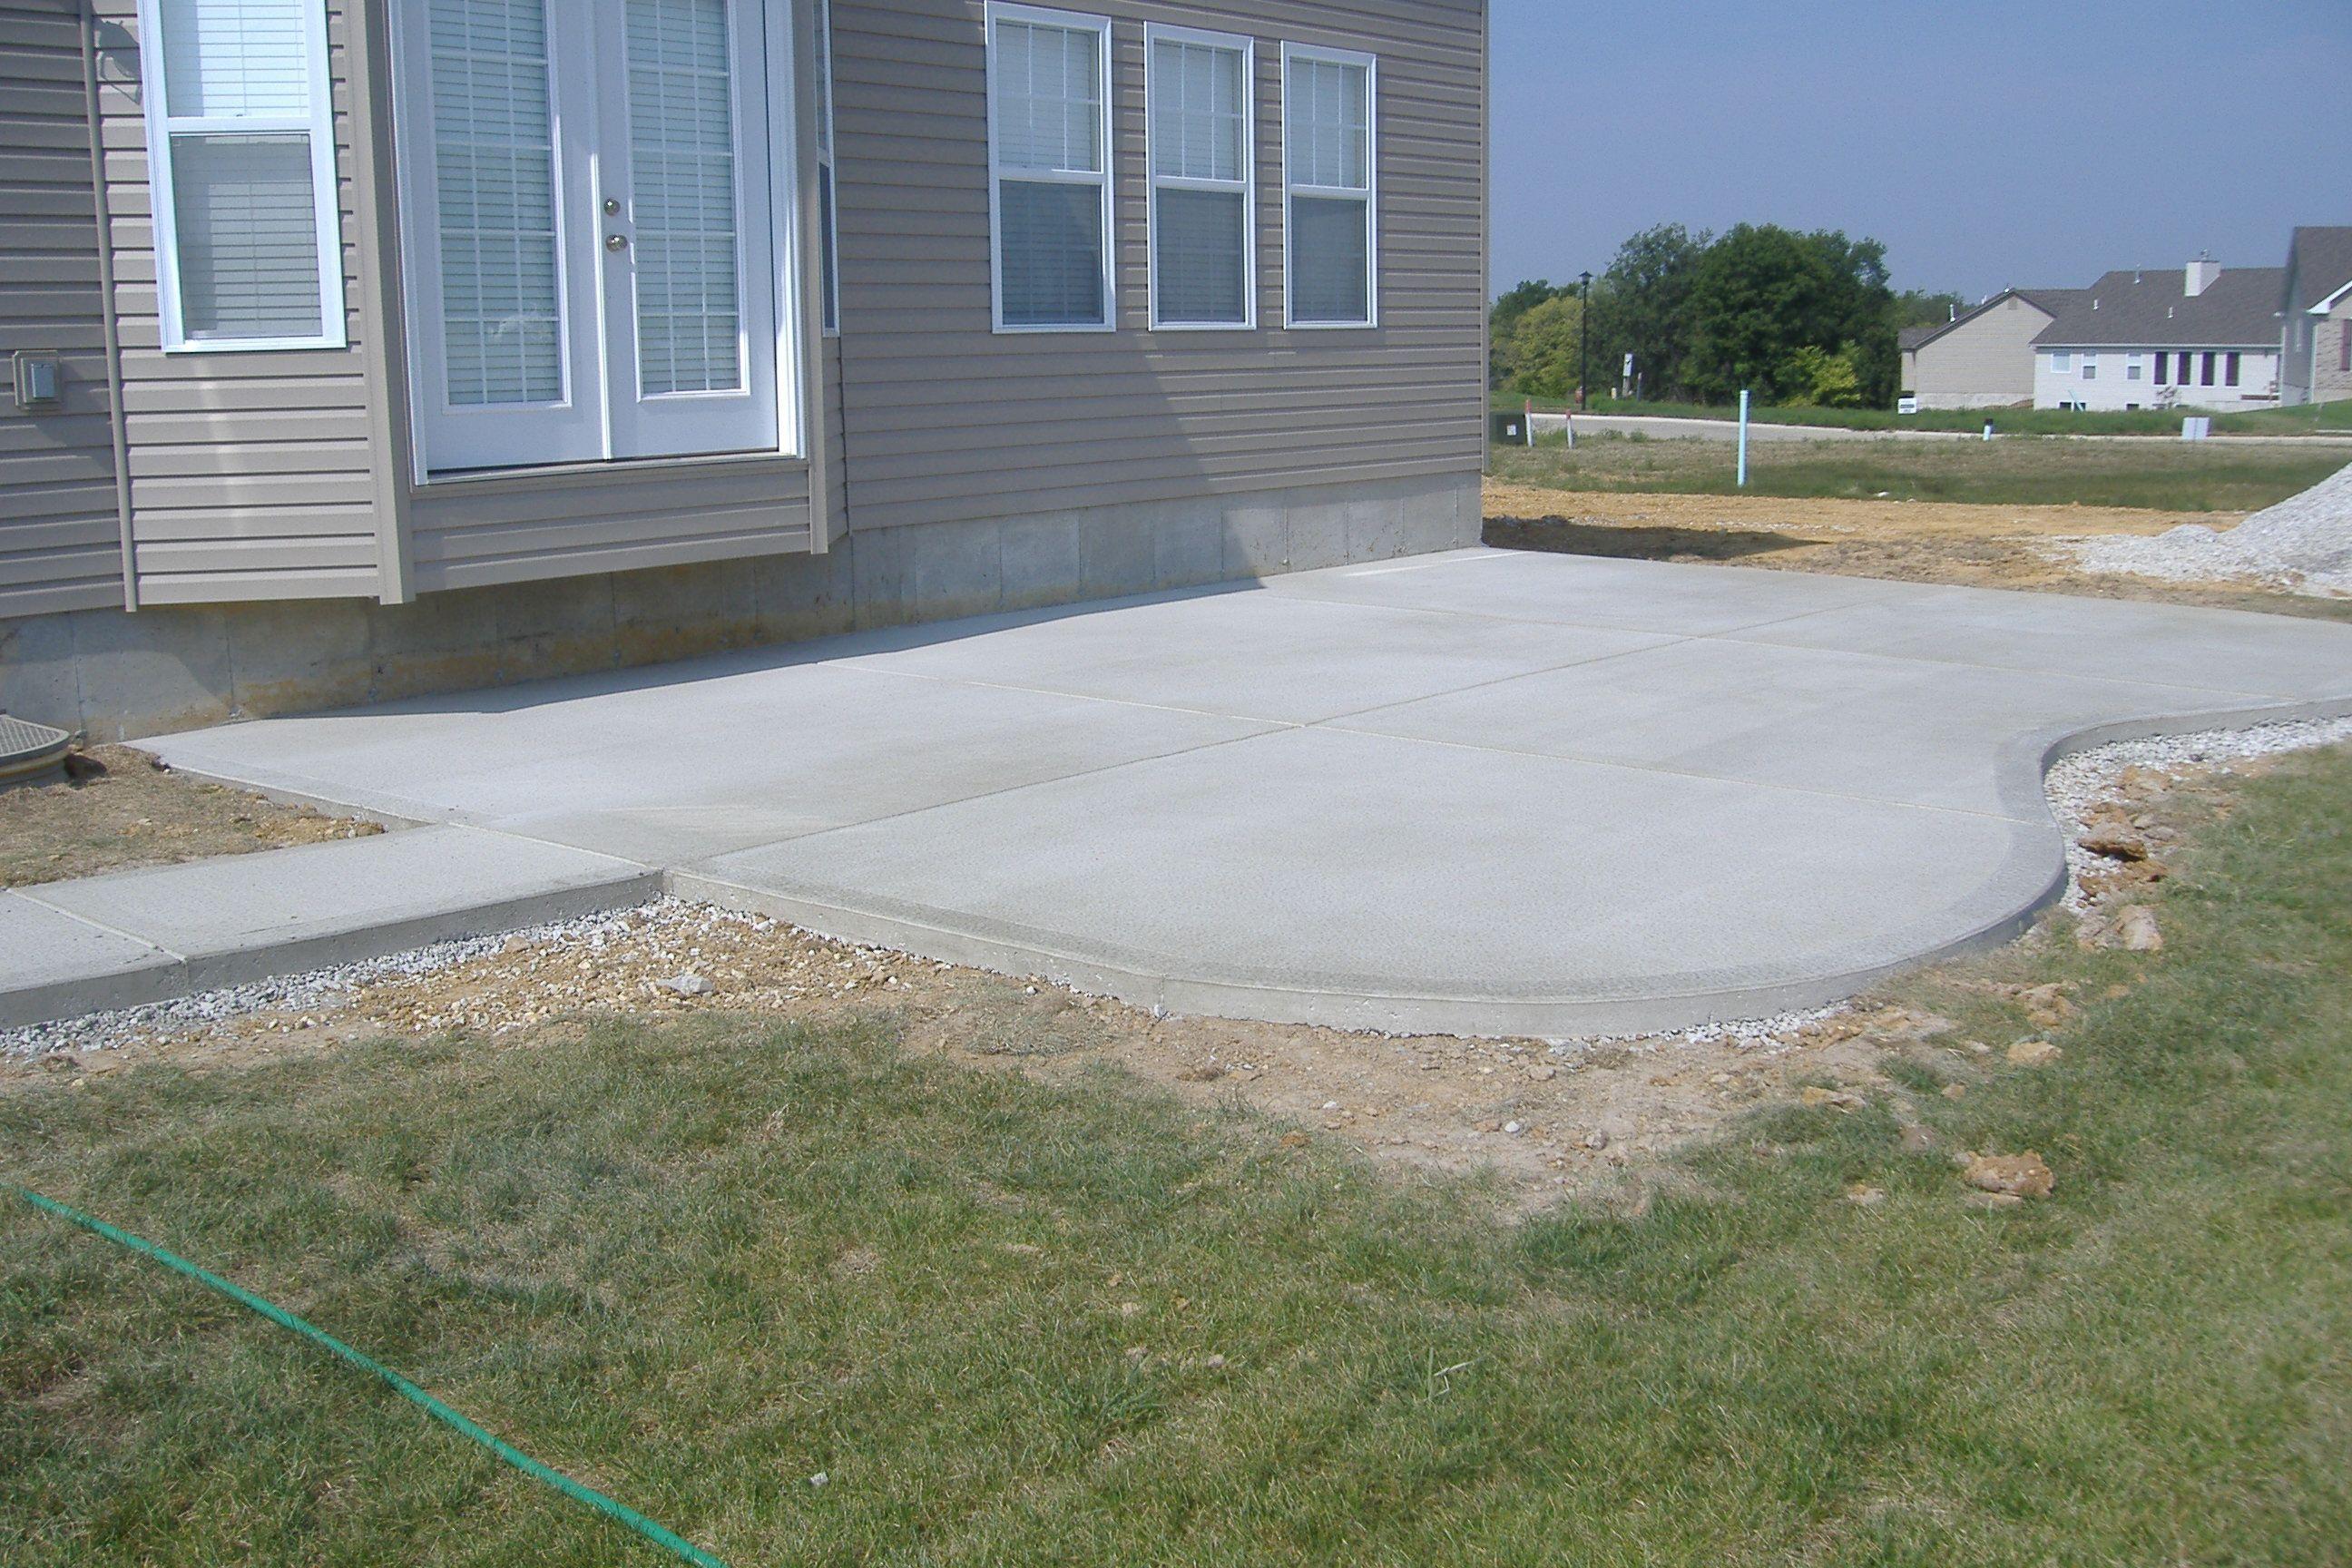 Simple Concrete Patio Design Ideas Thefoxy Blog with ... on Simple Concrete Patio Designs id=33147